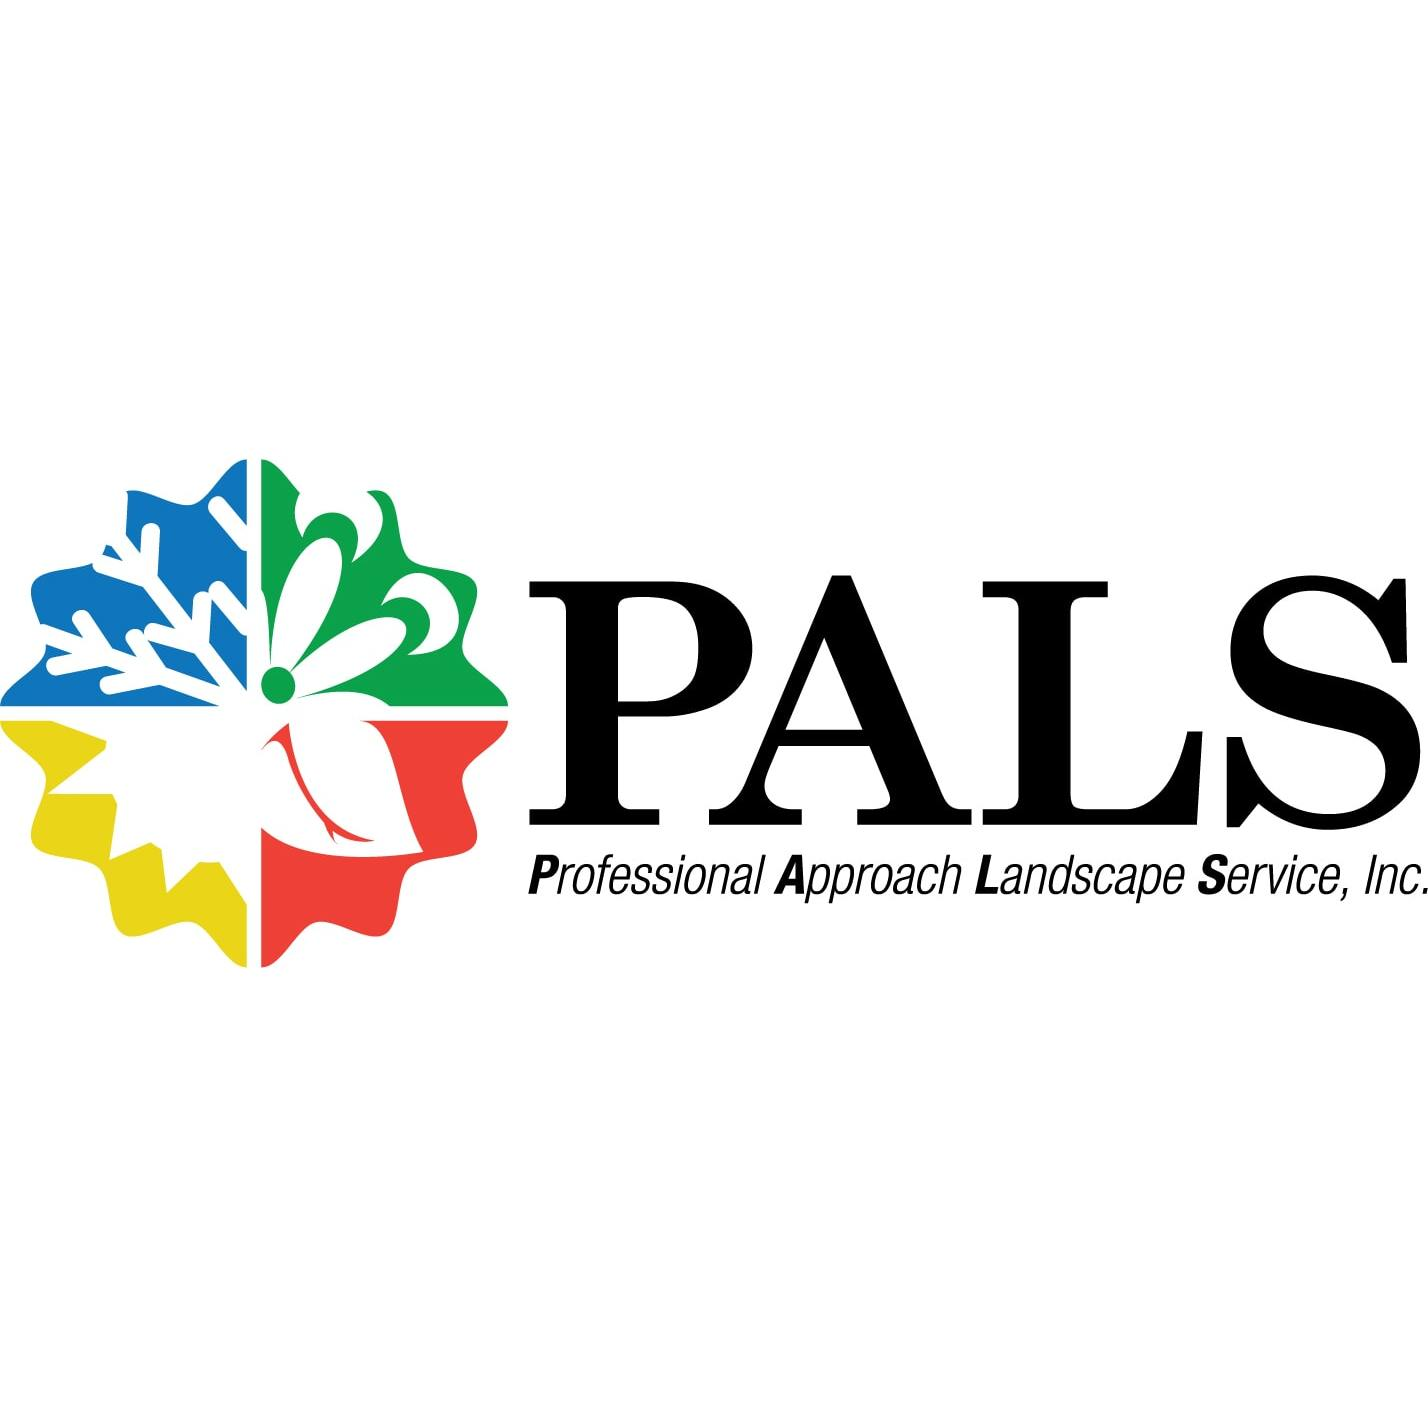 Professional Approach Landscape Service, Inc